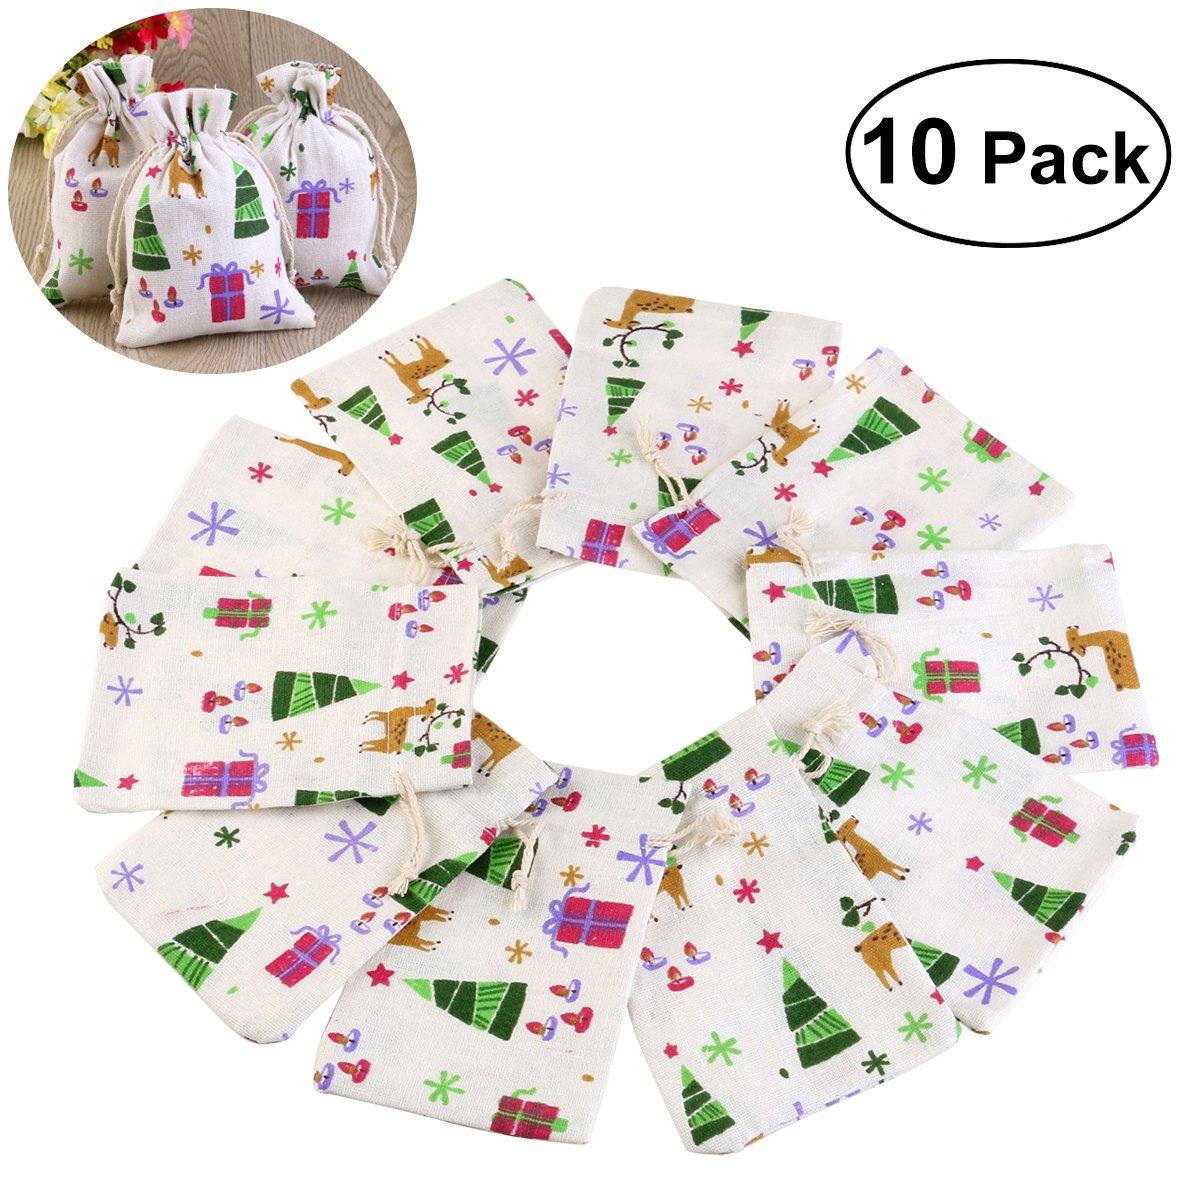 UEETEK 10pcs Natural Linen Jute Burlap Small Simple Sack Pouch Drawstring Bag Xmas Pattern Jewery Bag Wedding Favor